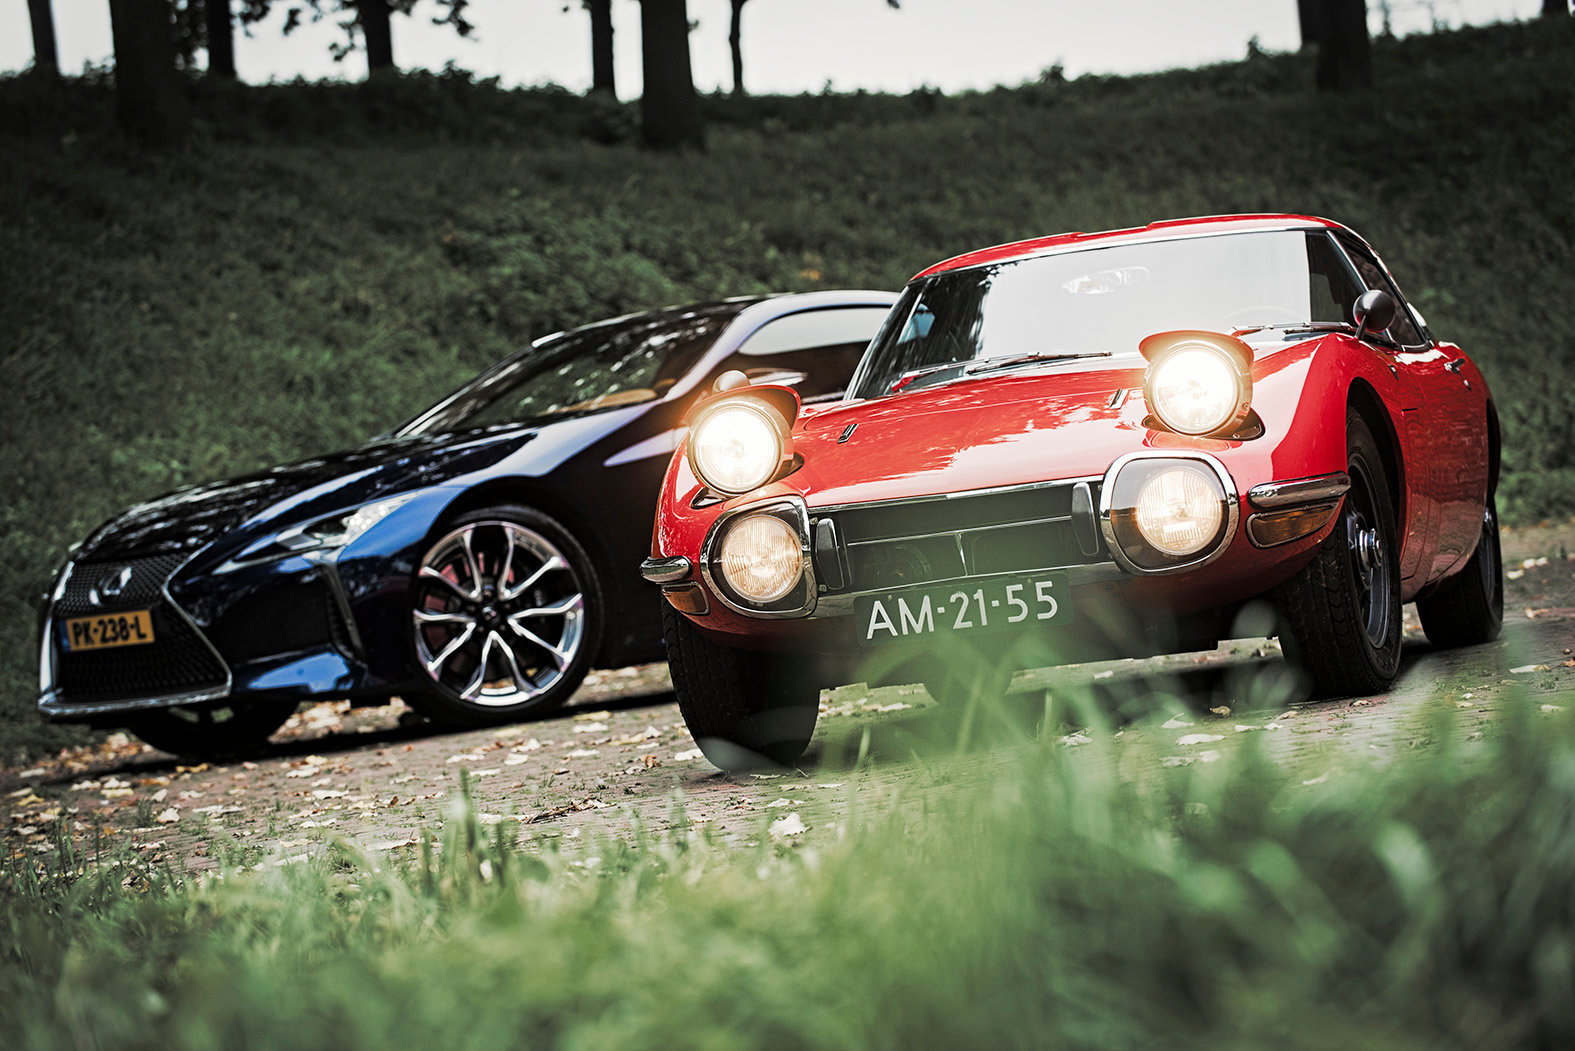 LEXUS LC500H vs TOYOTA 2000 GT